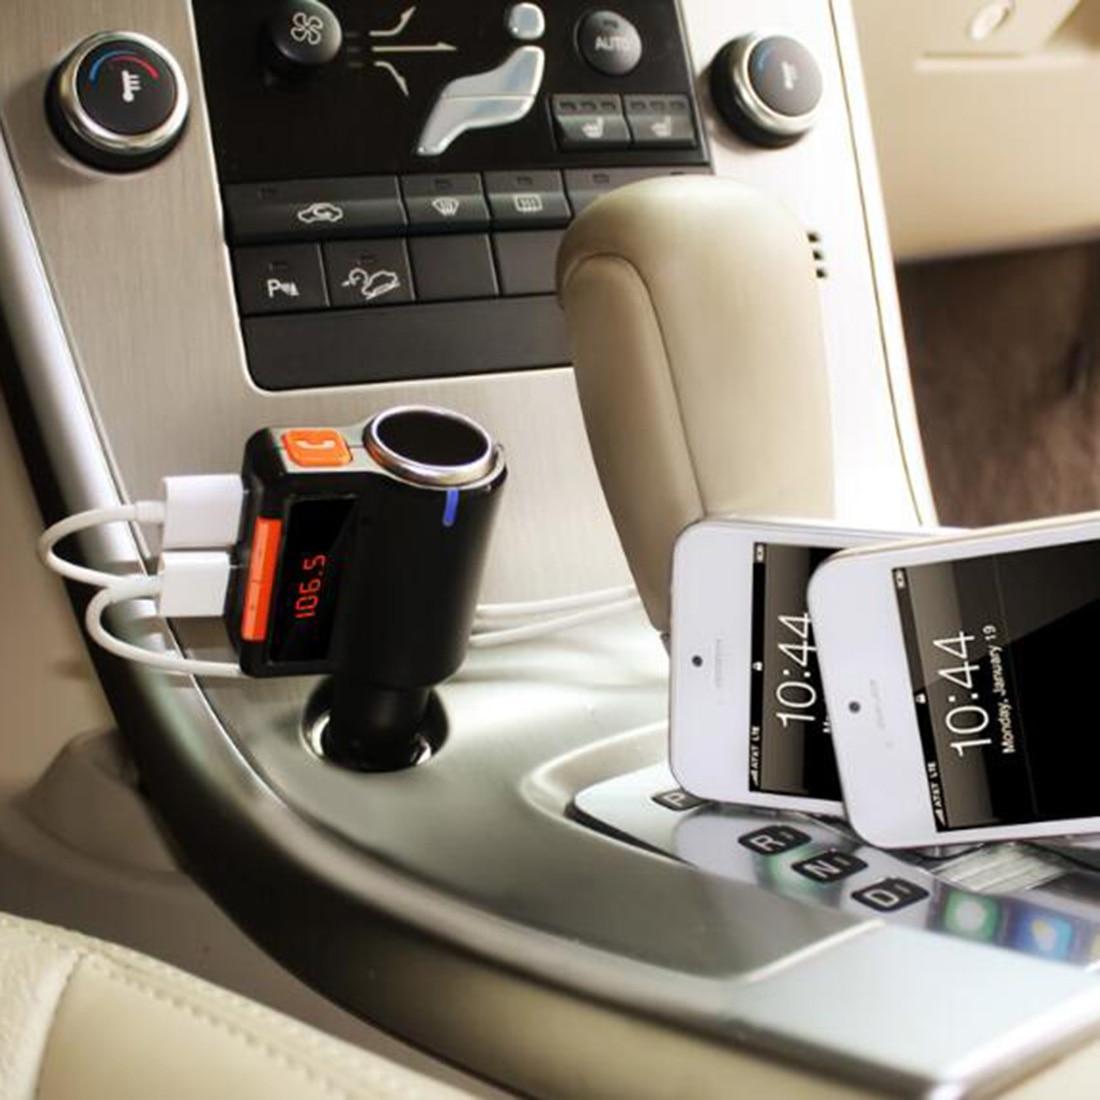 Marsnaska FM transmitter Modulator Bluetooth Handfree Car MP3 Player Radio Adapter Dual USB Cigarette Lighter For CellPhone